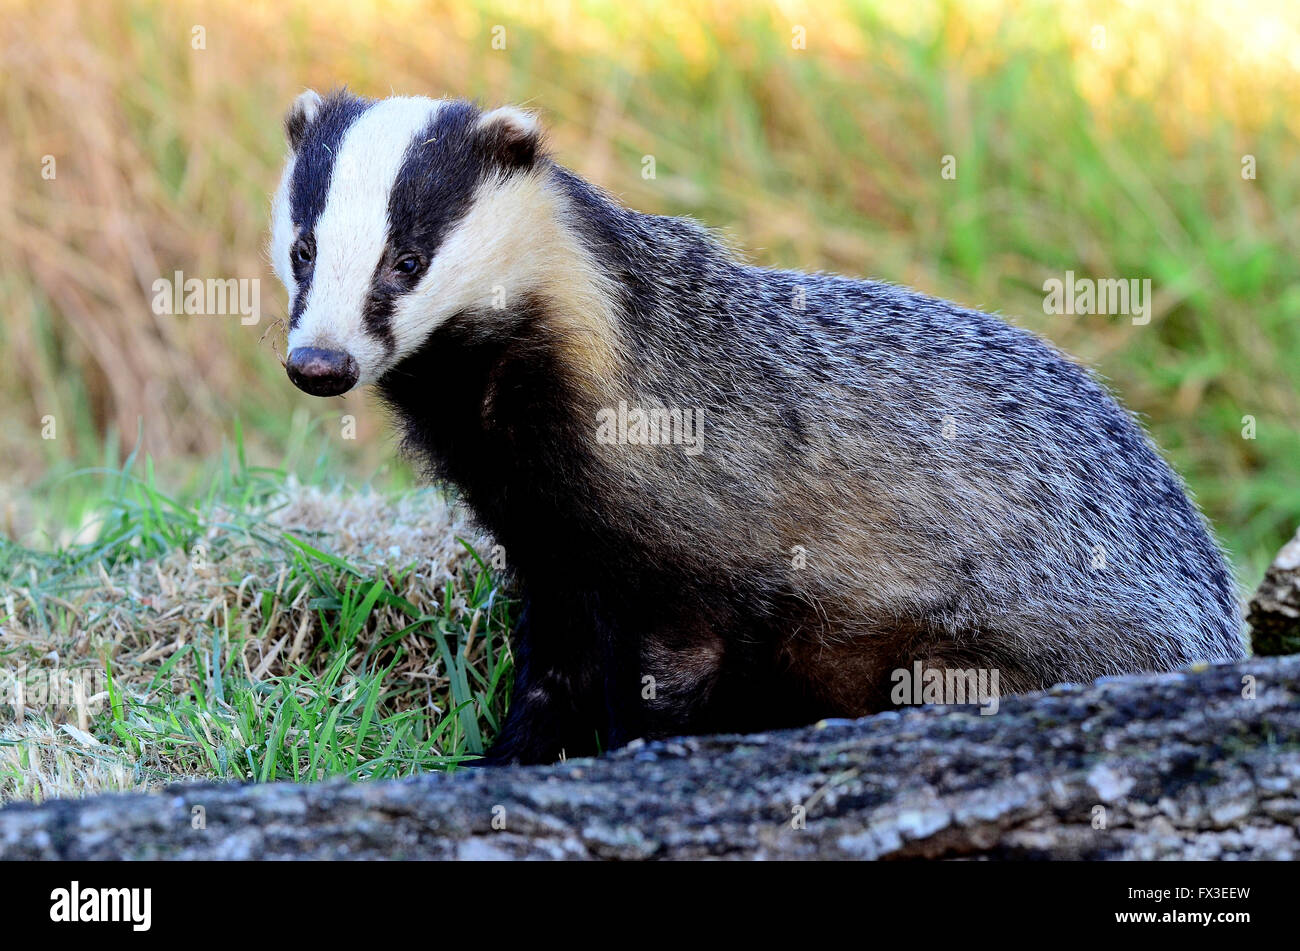 Adult badger at sunset. Dorset, UK Stock Photo